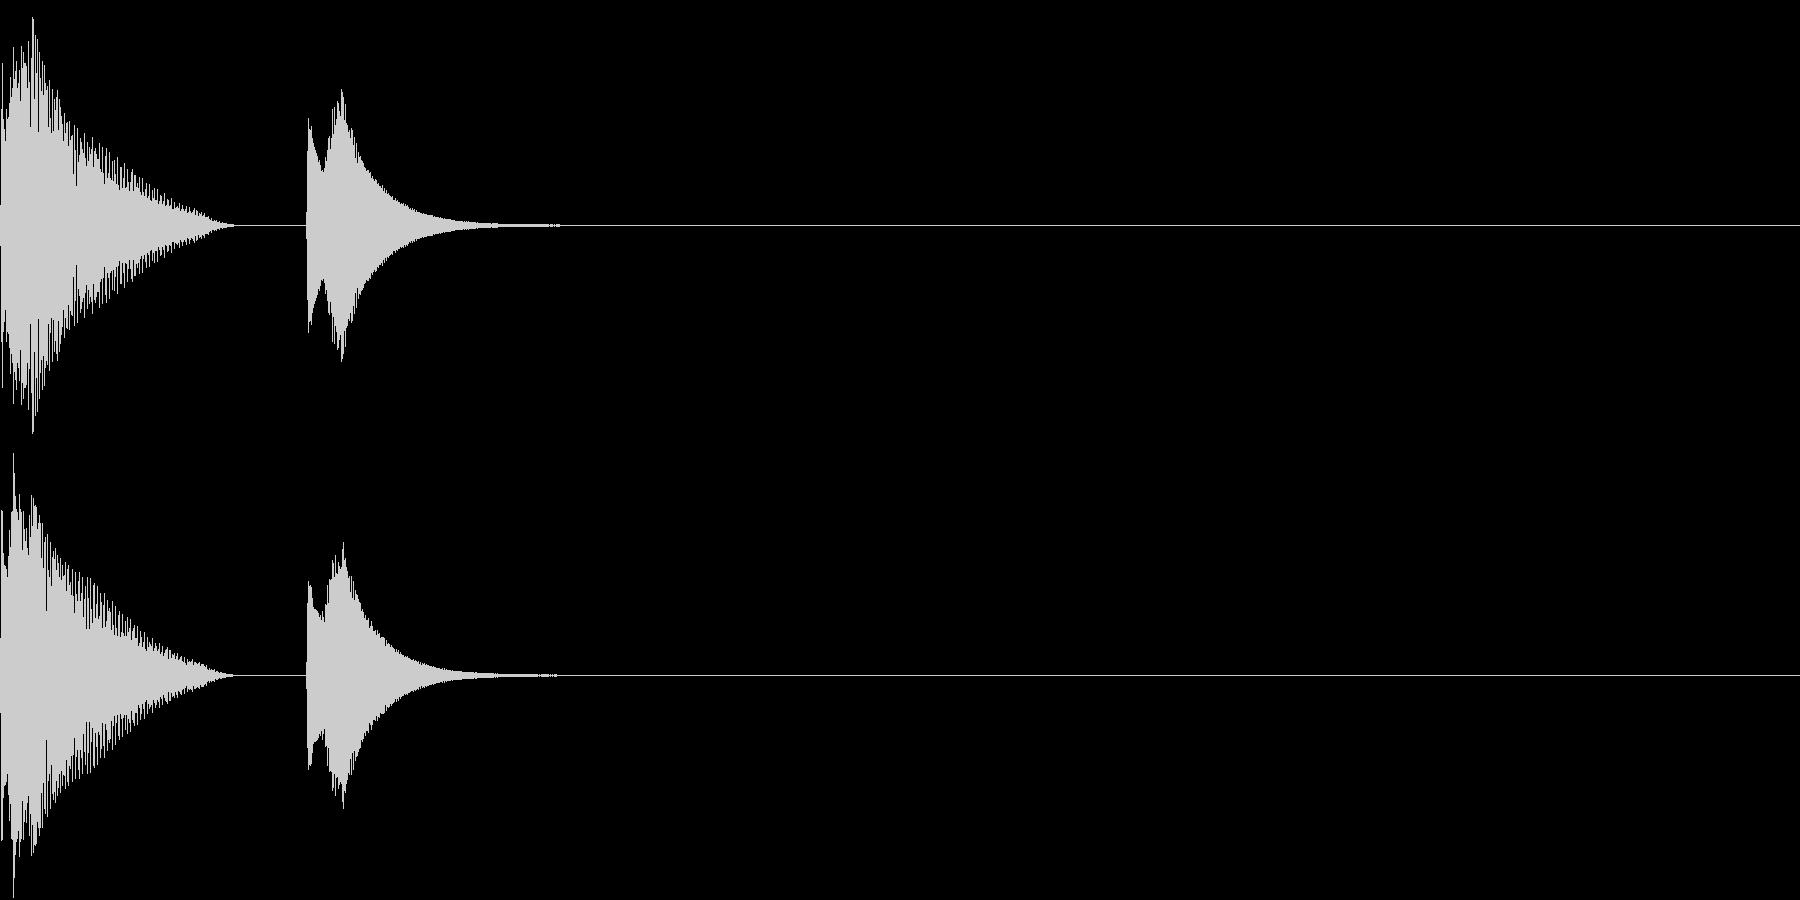 Click ユニークなクリック音の未再生の波形